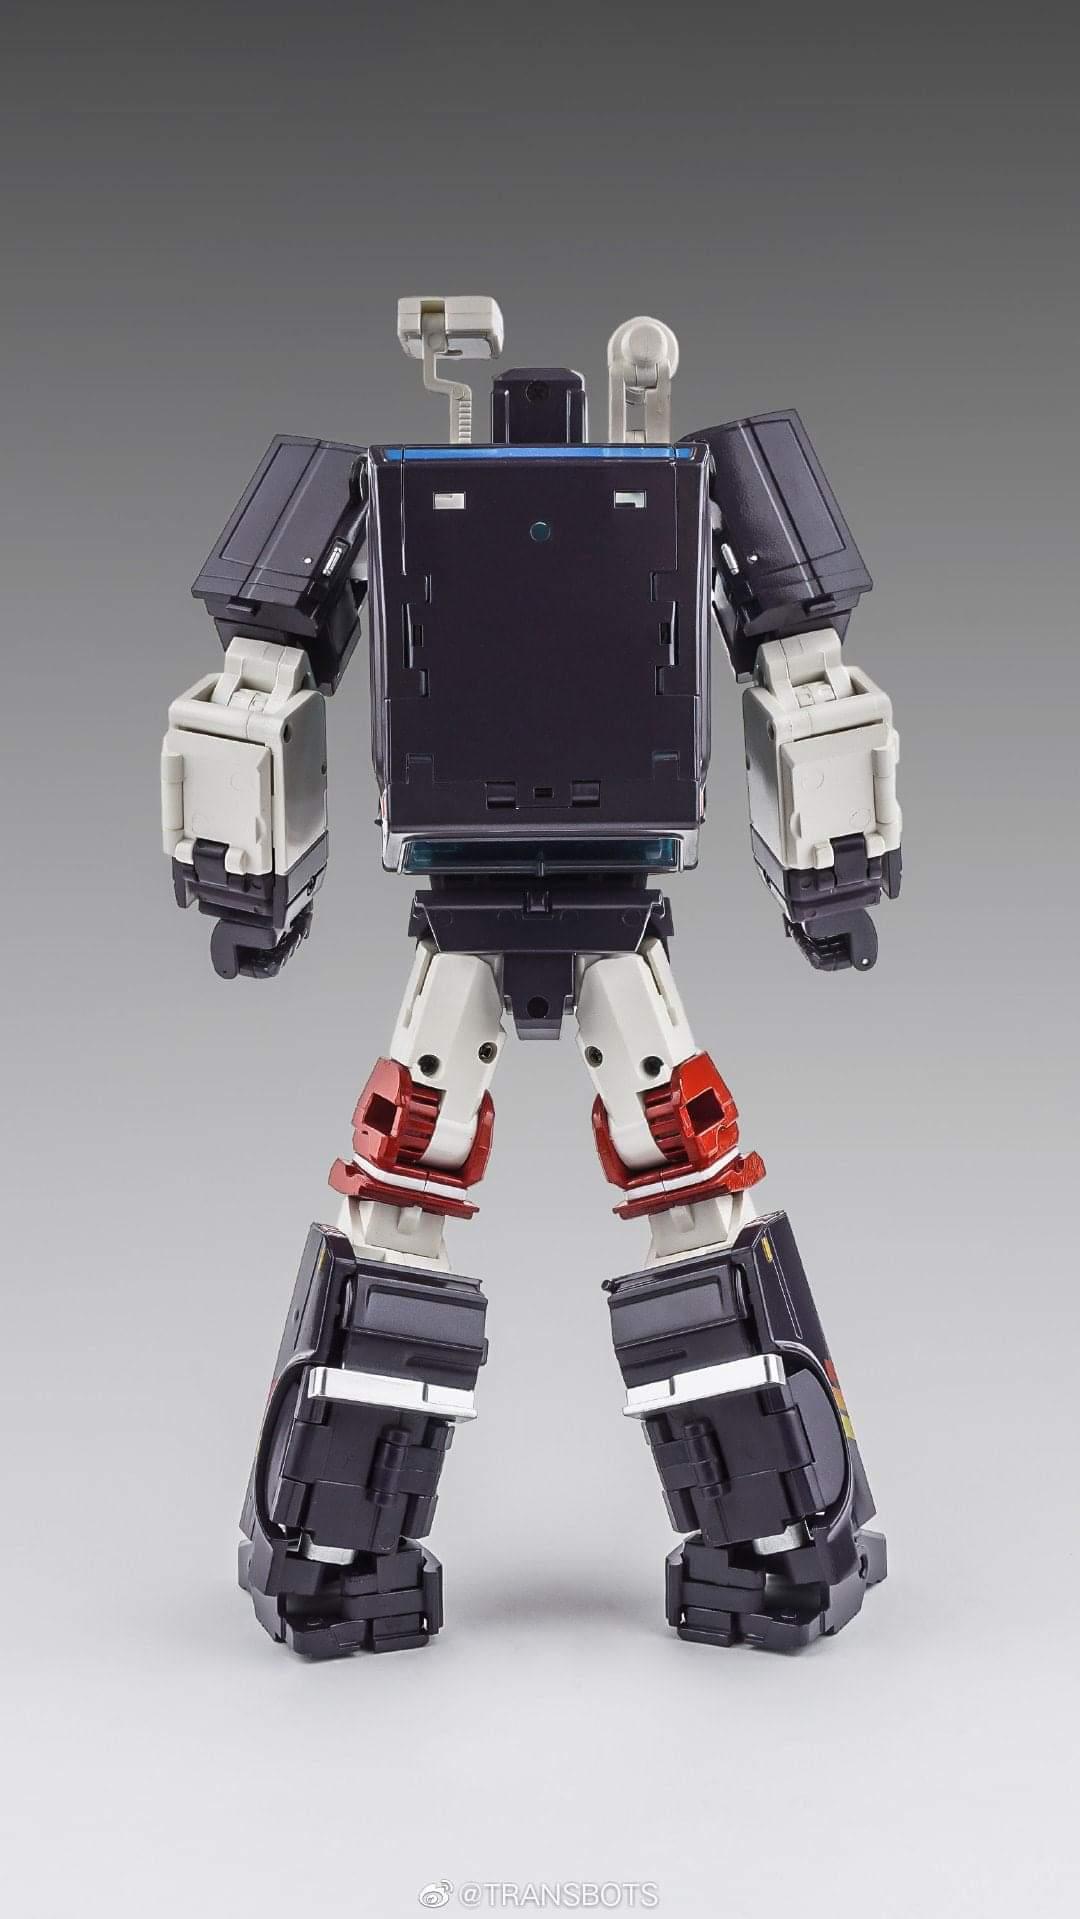 [X-Transbots] Produit Tiers - Jouet MX-VIII Aegis - aka Trailbreaker/Glouton - Page 2 IF3zCxyr_o